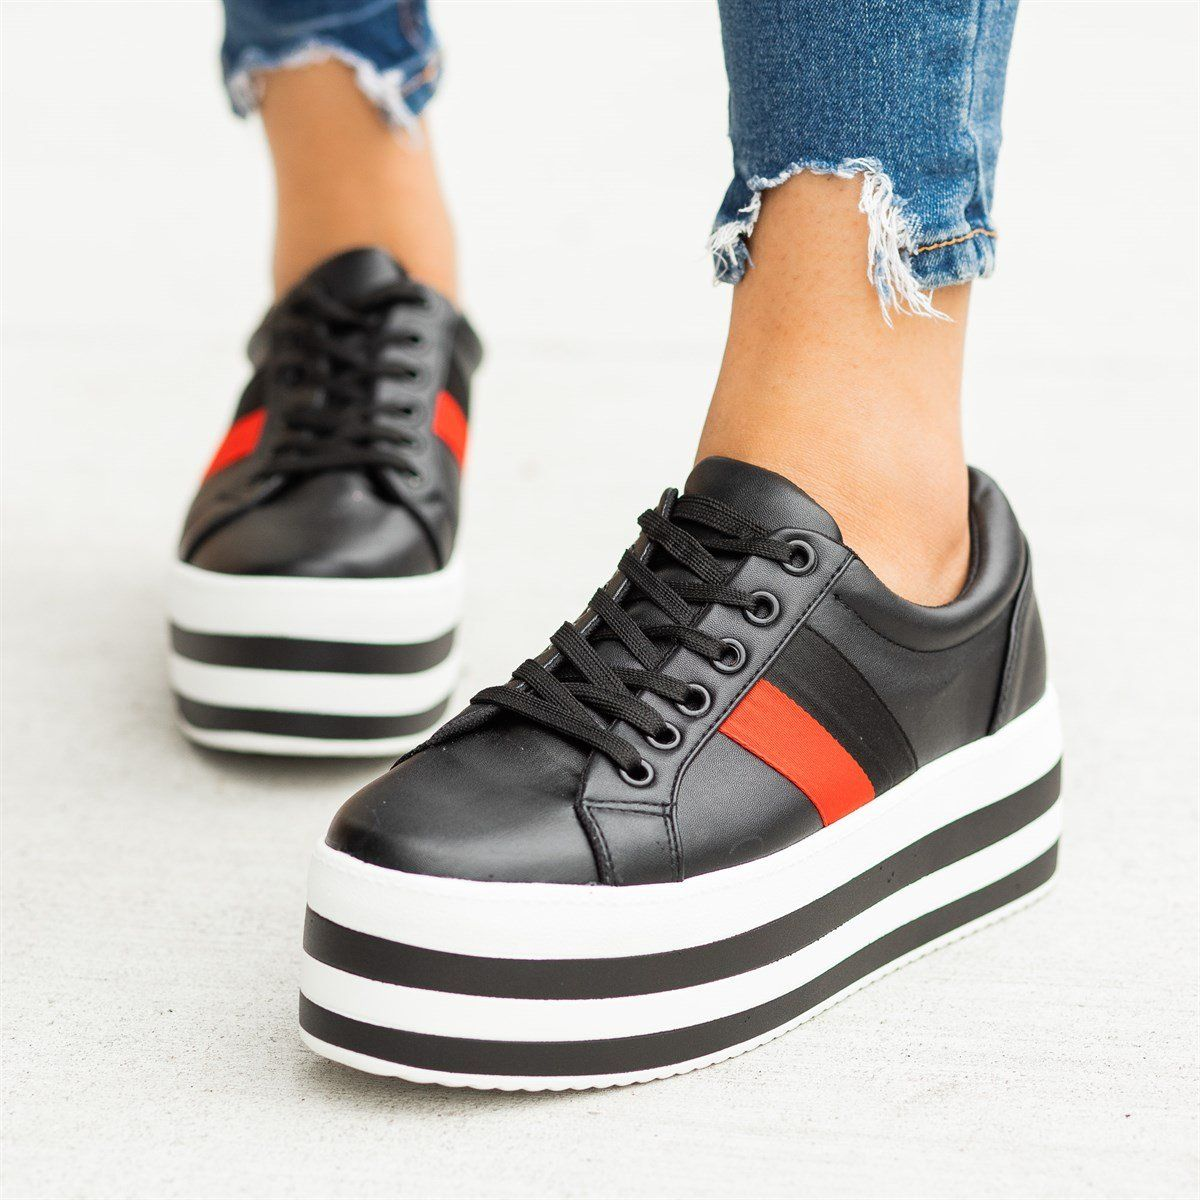 Trendy Striped Platform Sneakers